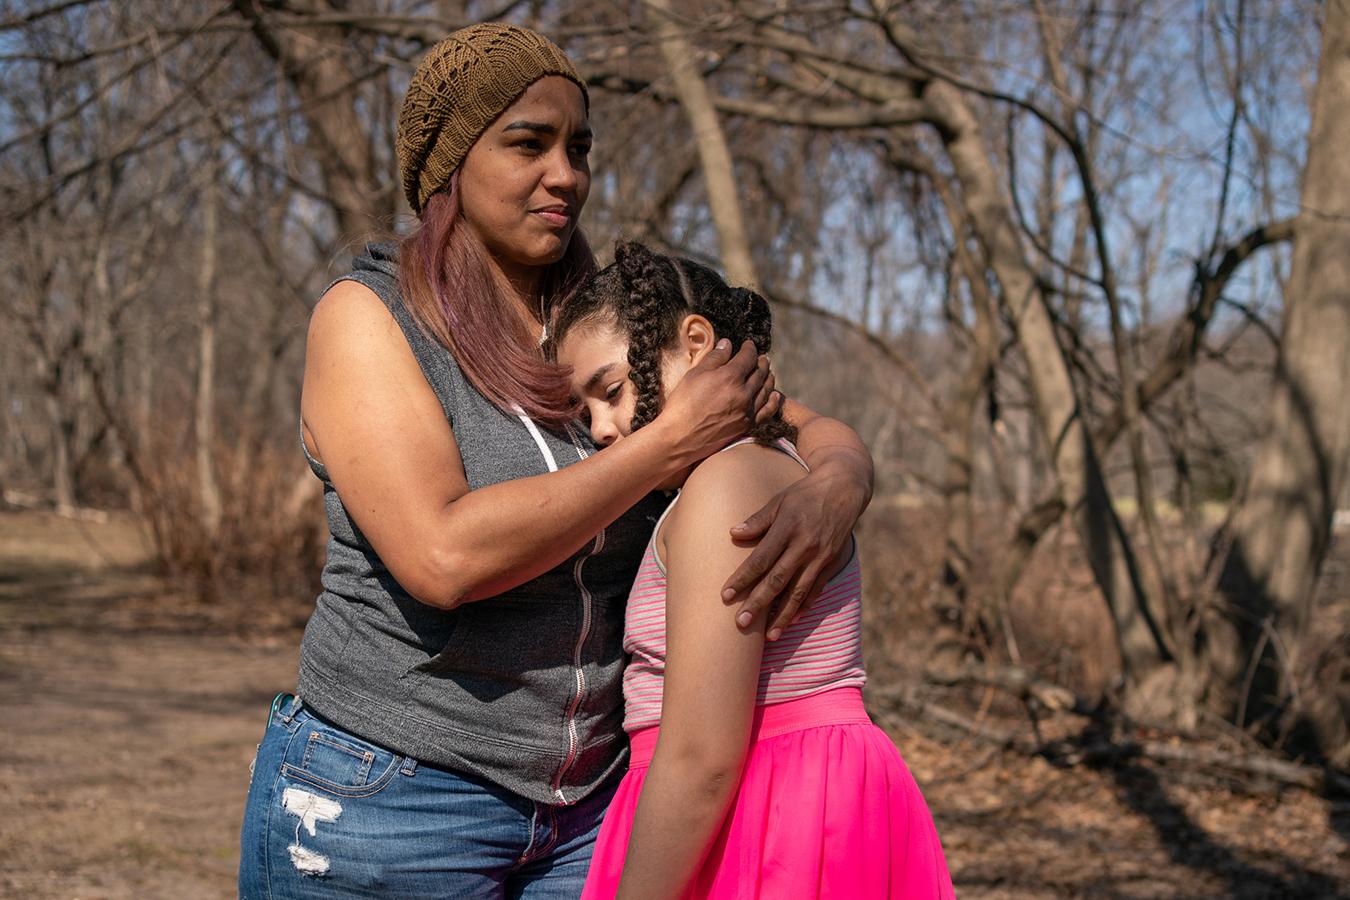 Alexandra Sierra hugs her daughter